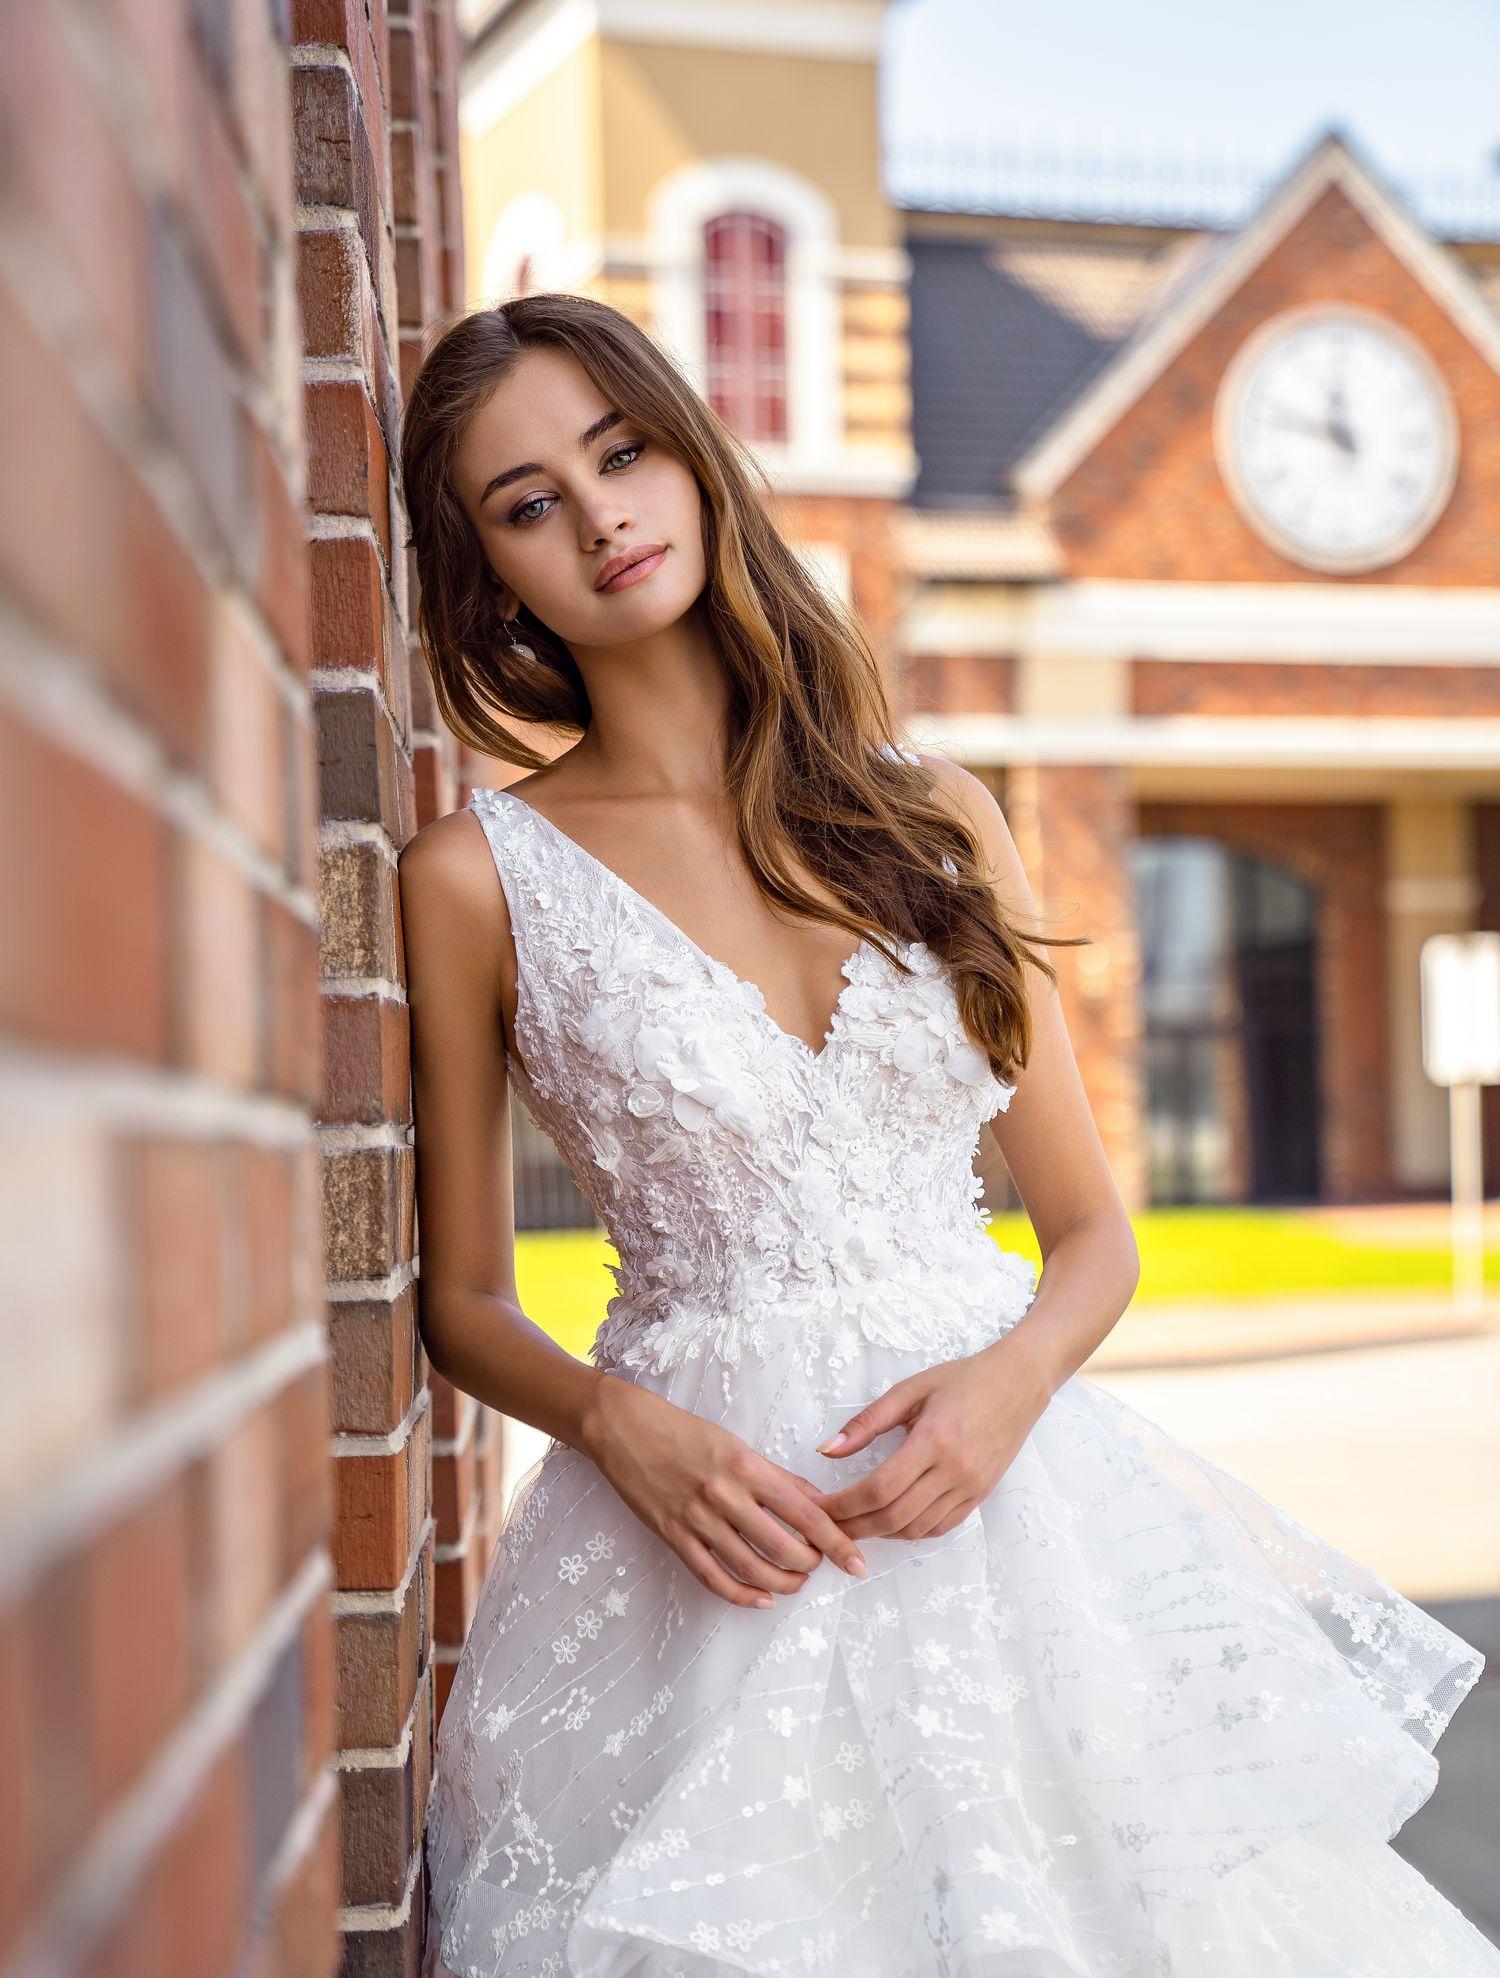 Wedding dress with ruffles wholesale from Supernova-1